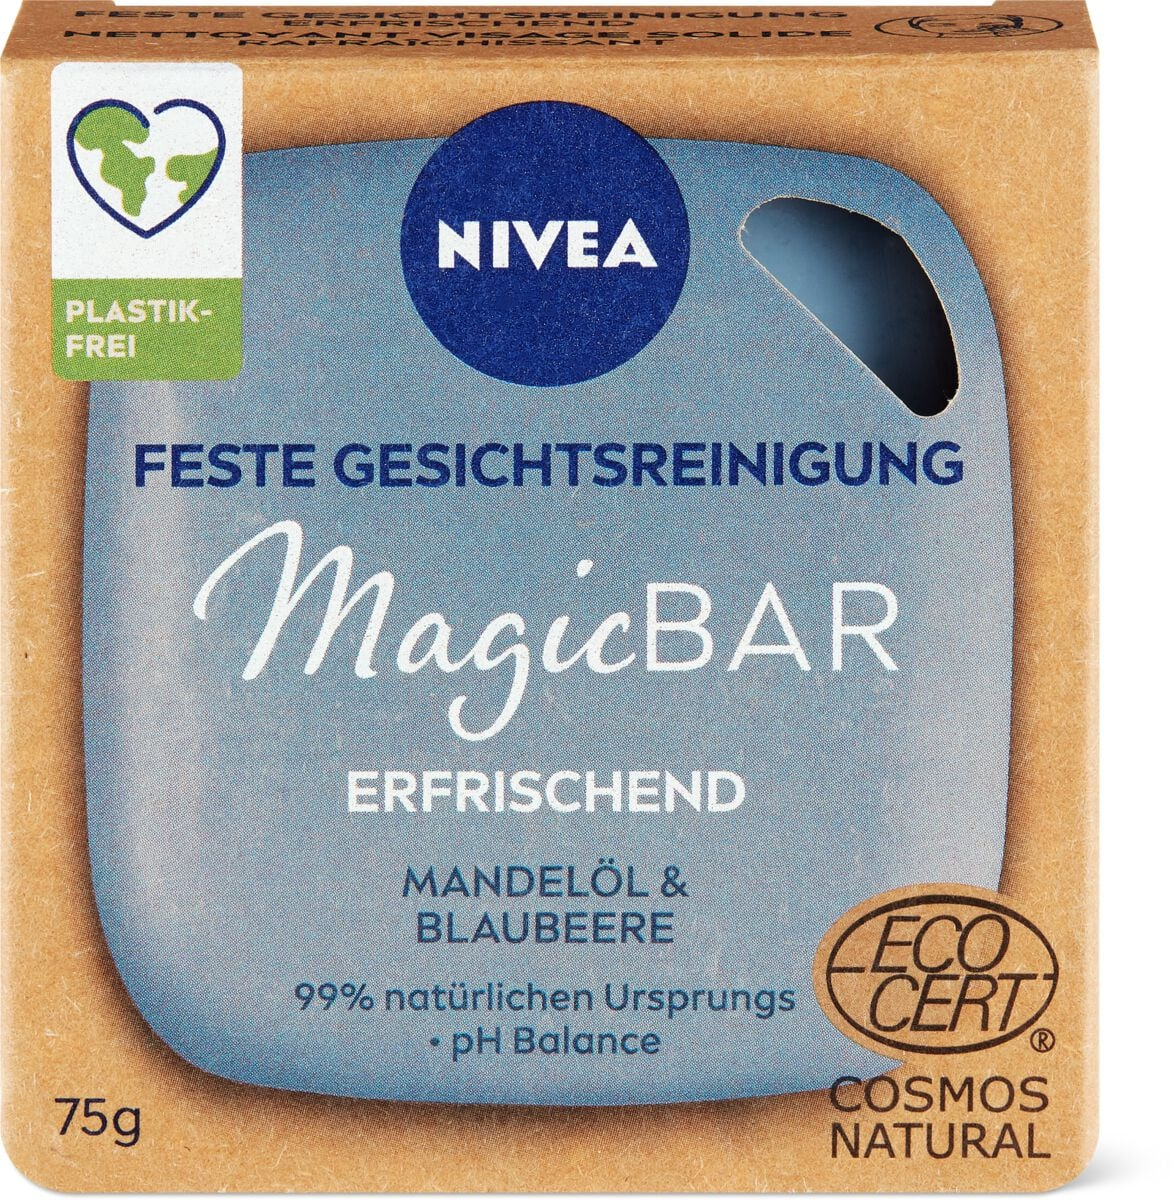 Nivea Magic Bar Erfrischend